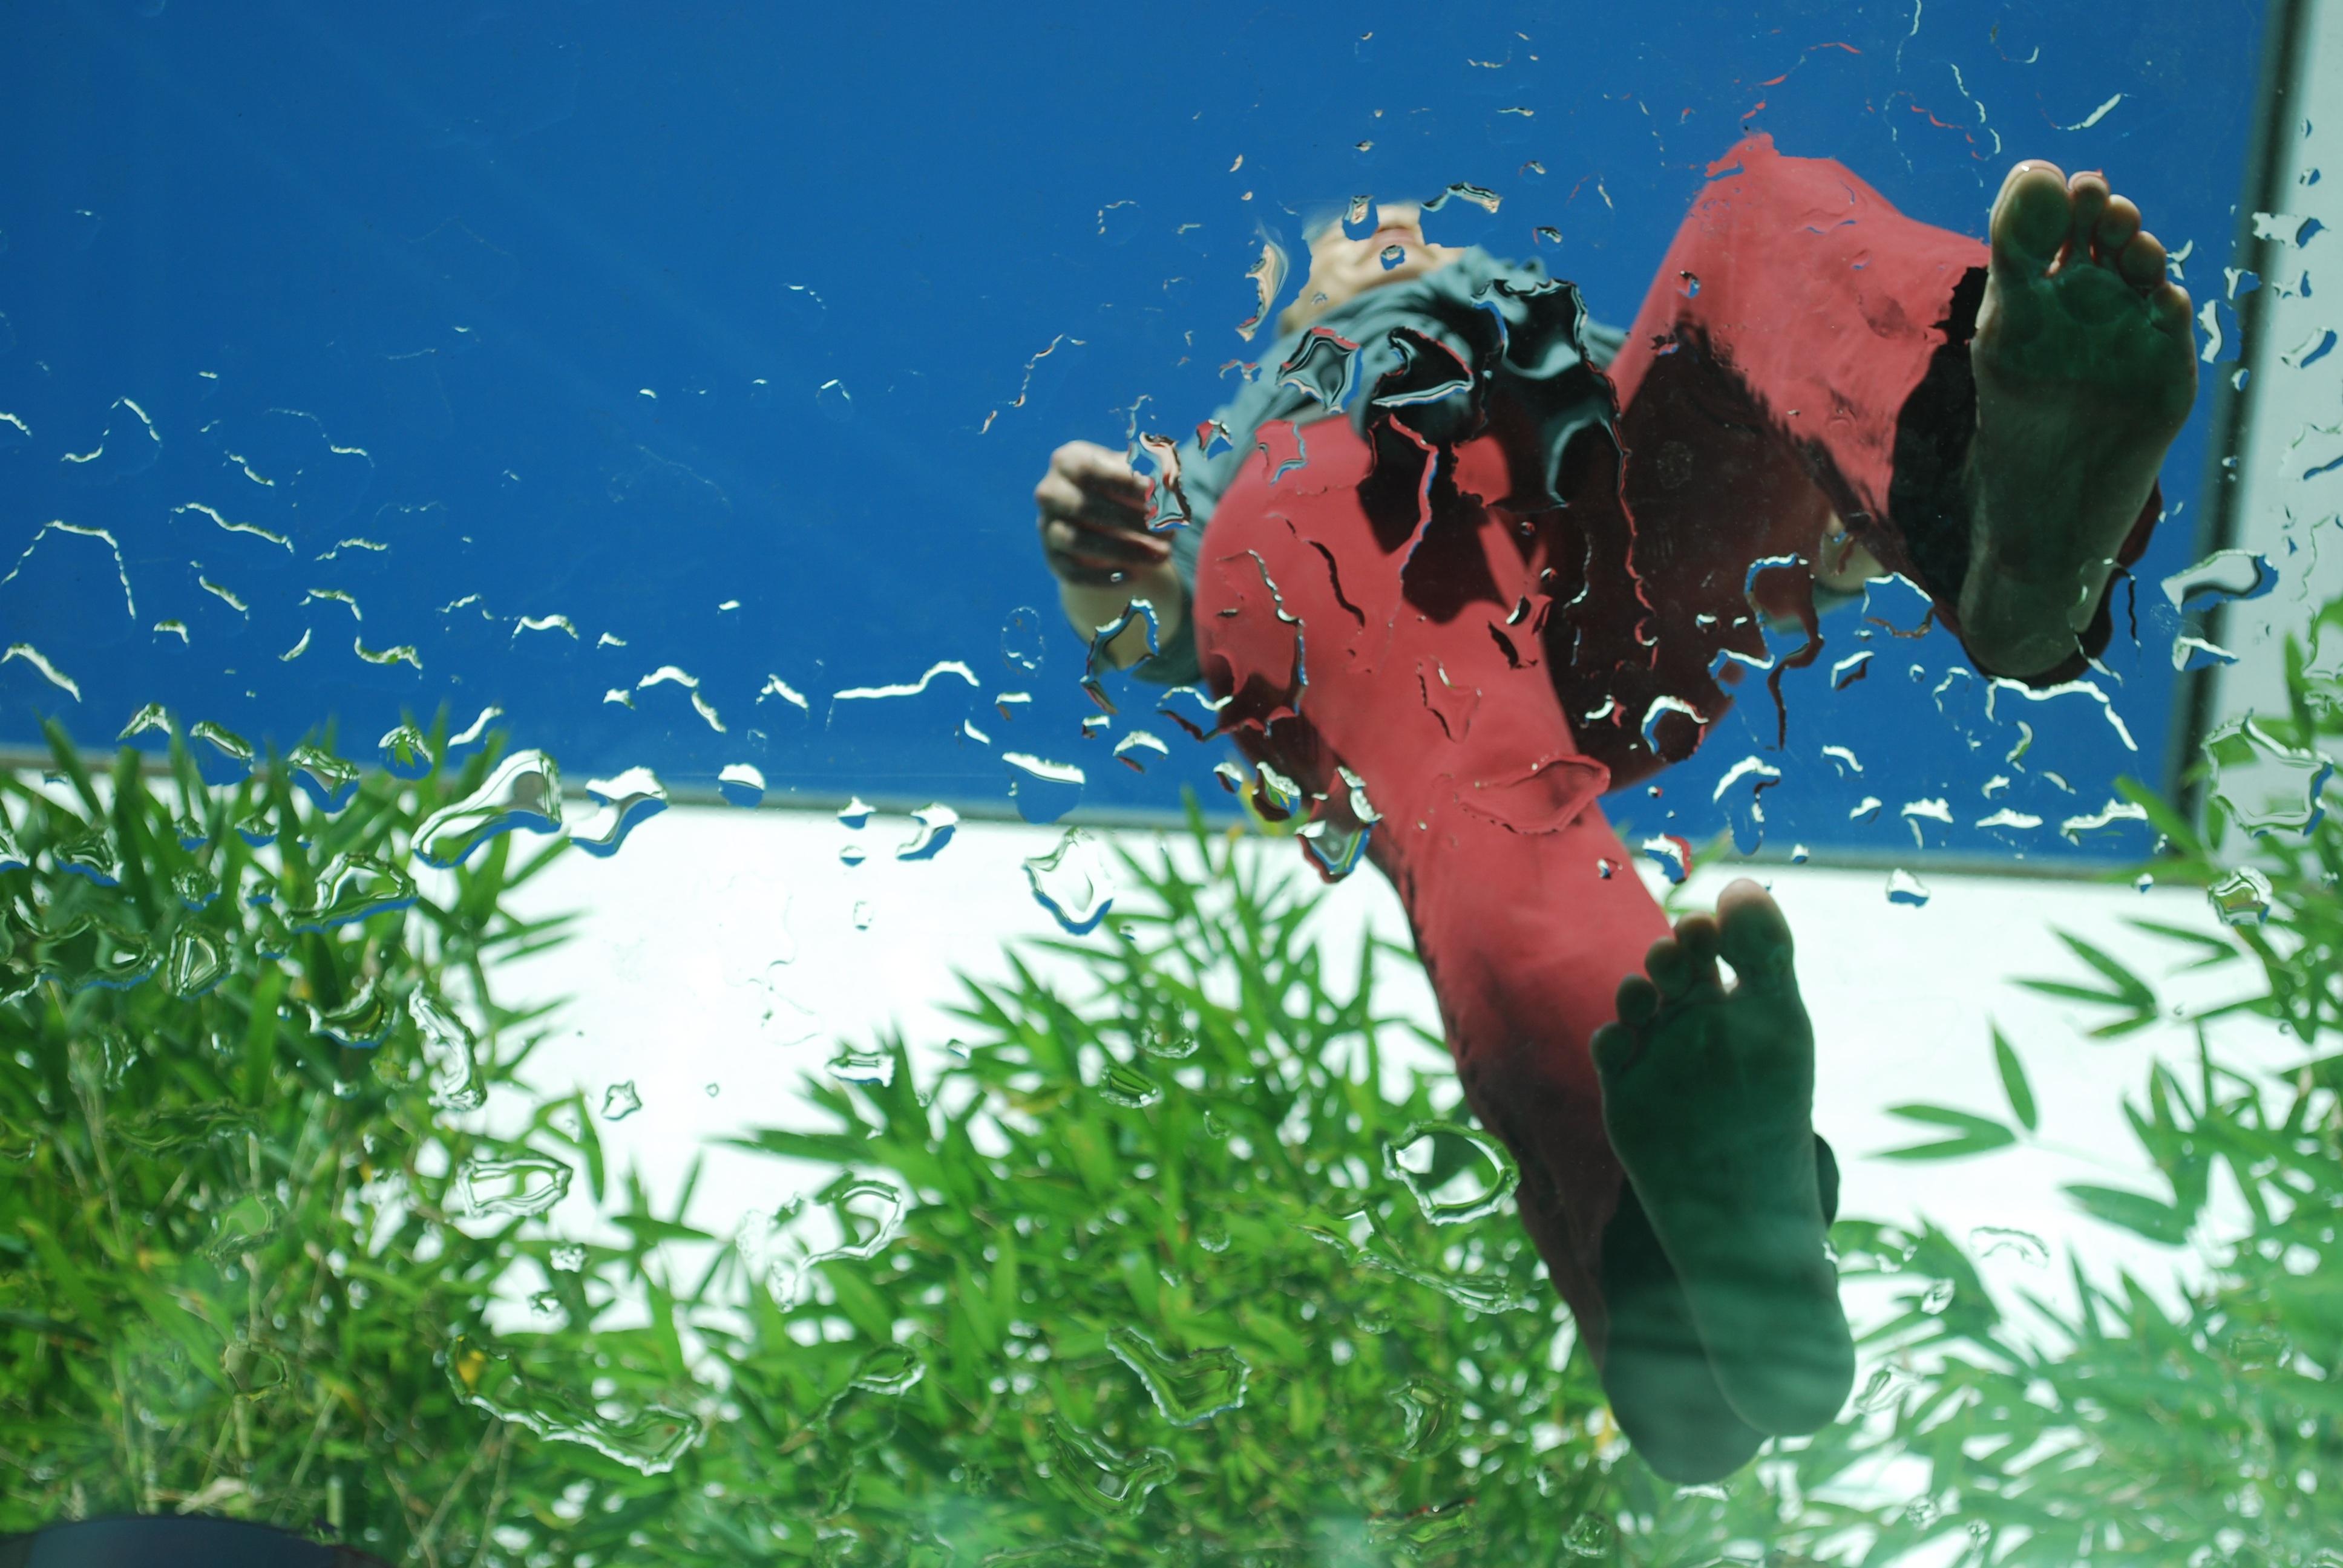 Gambar Berjalan Langkah Kaki Wanita Bawah Air Manusia